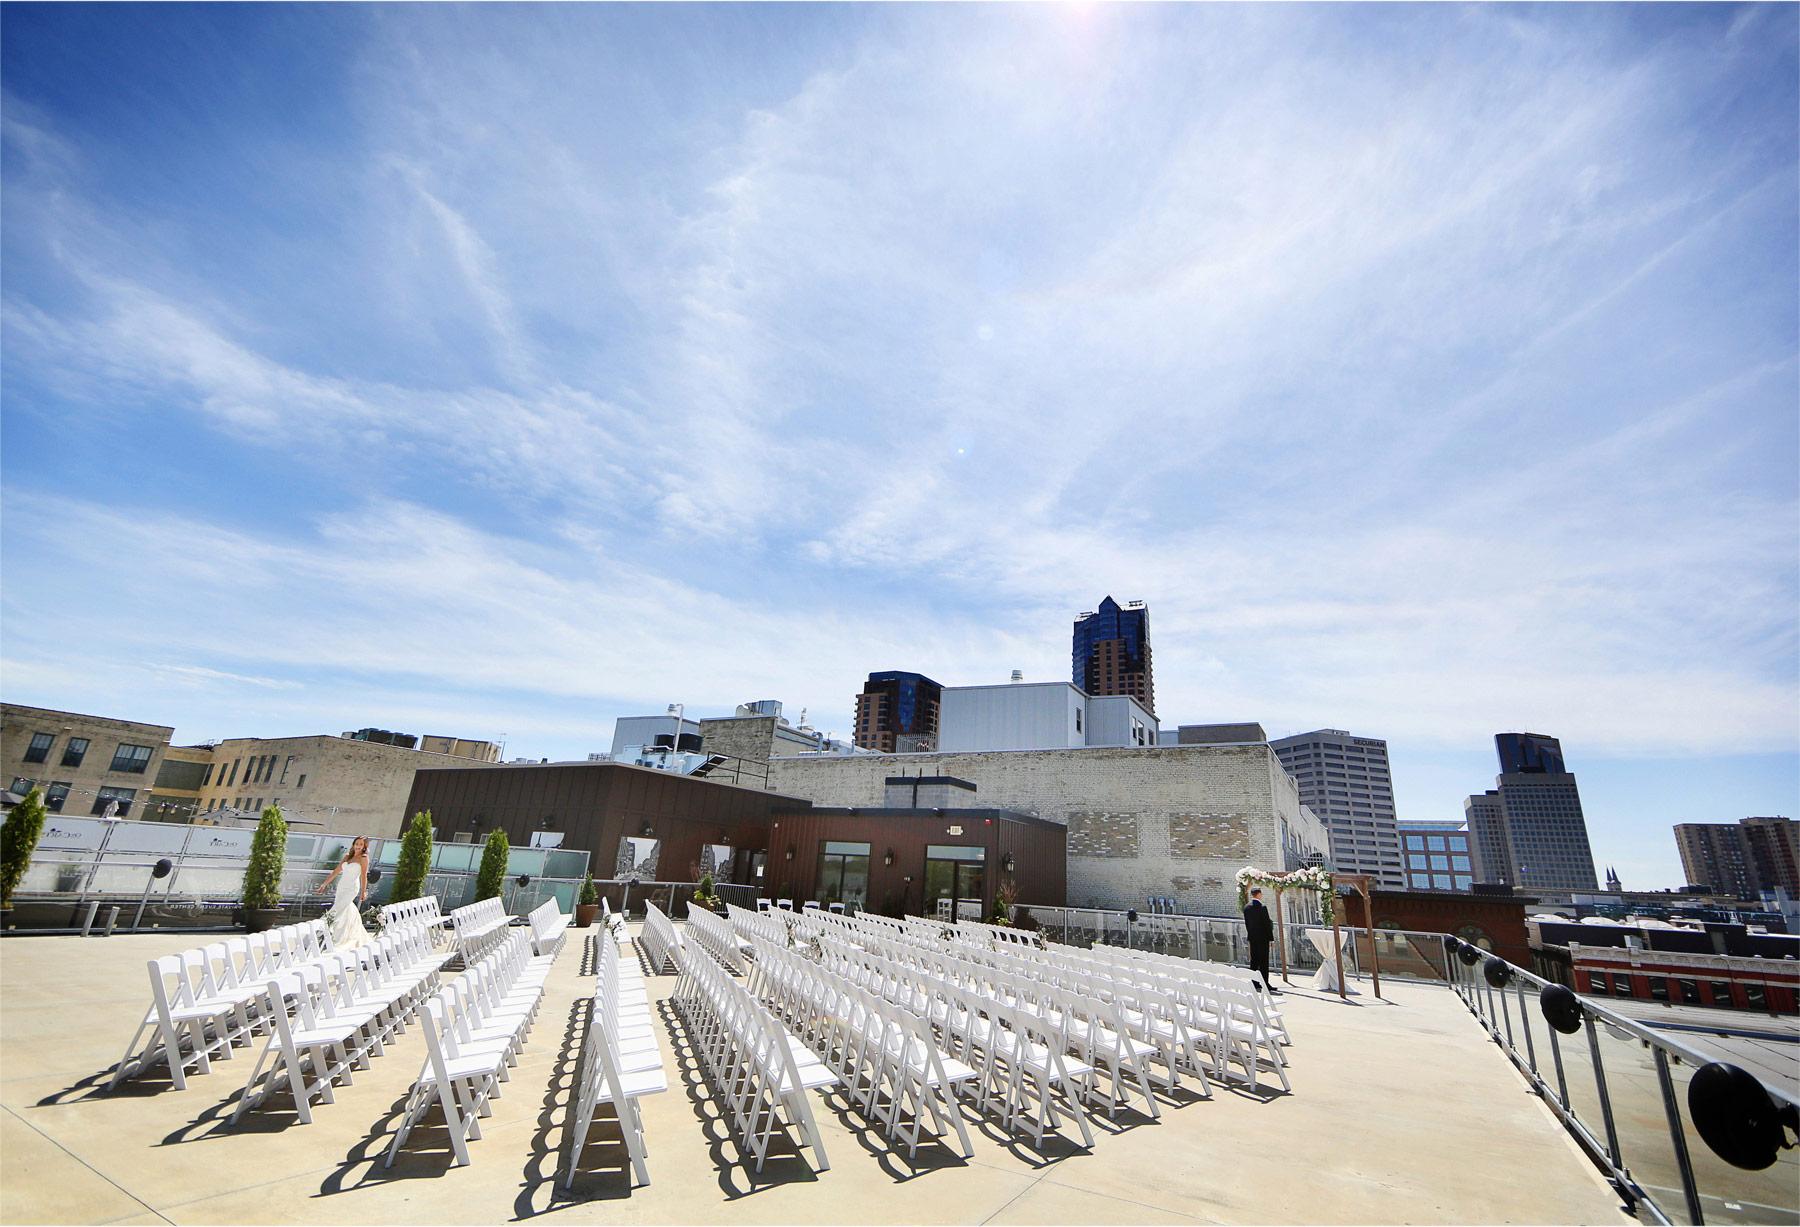 05-Saint-Paul-Minnesota-Wedding-Photographer-by-Andrew-Vick-Photography-Summer-Abulae-First-Meeting-Bride-Groom-Molly-and-Dan.jpg